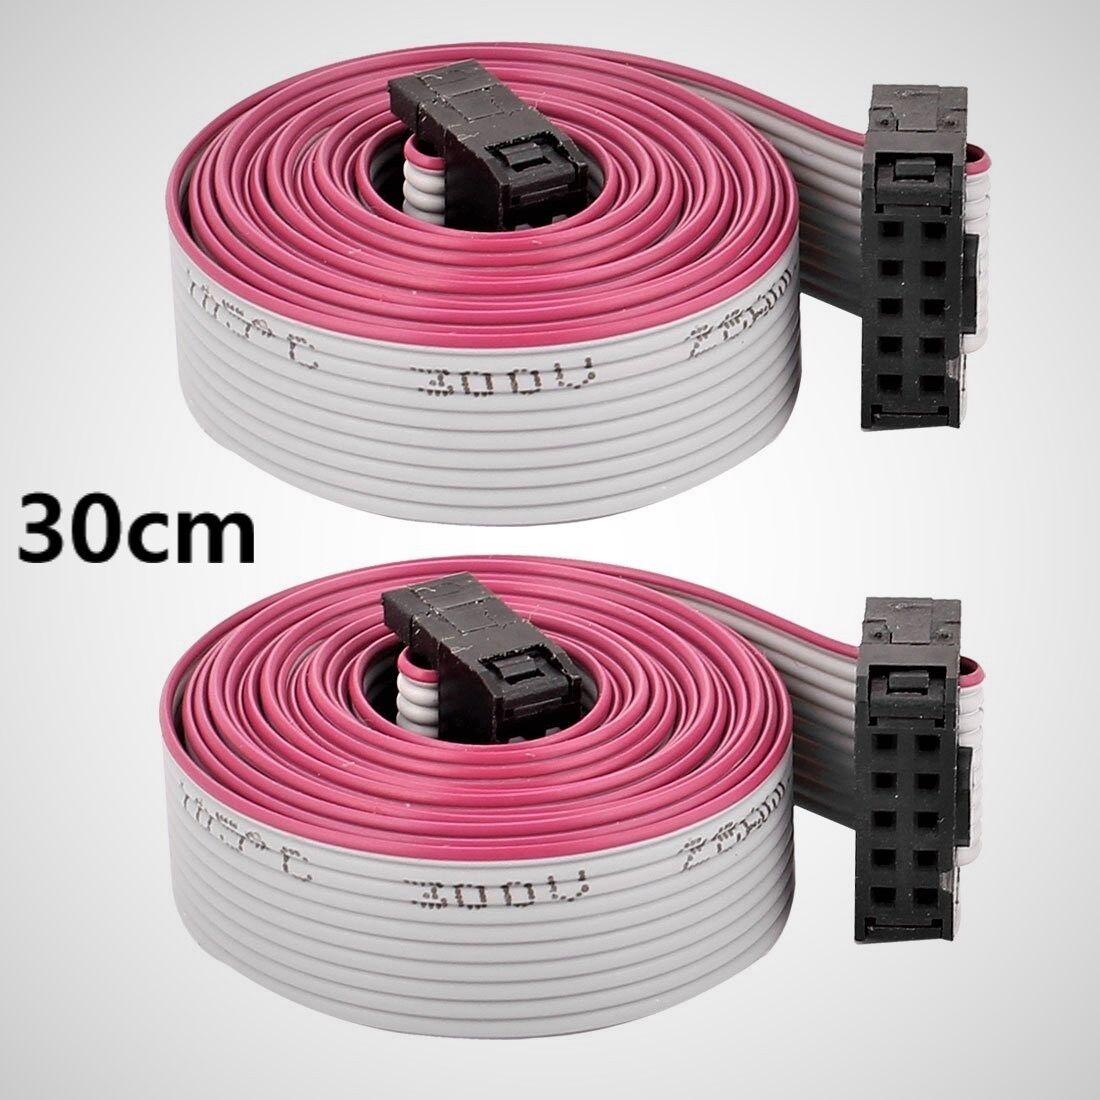 30cm LCD Cable 3D Printer Prusa MK3 Creality CR-10 Lack 2004 12864 10P